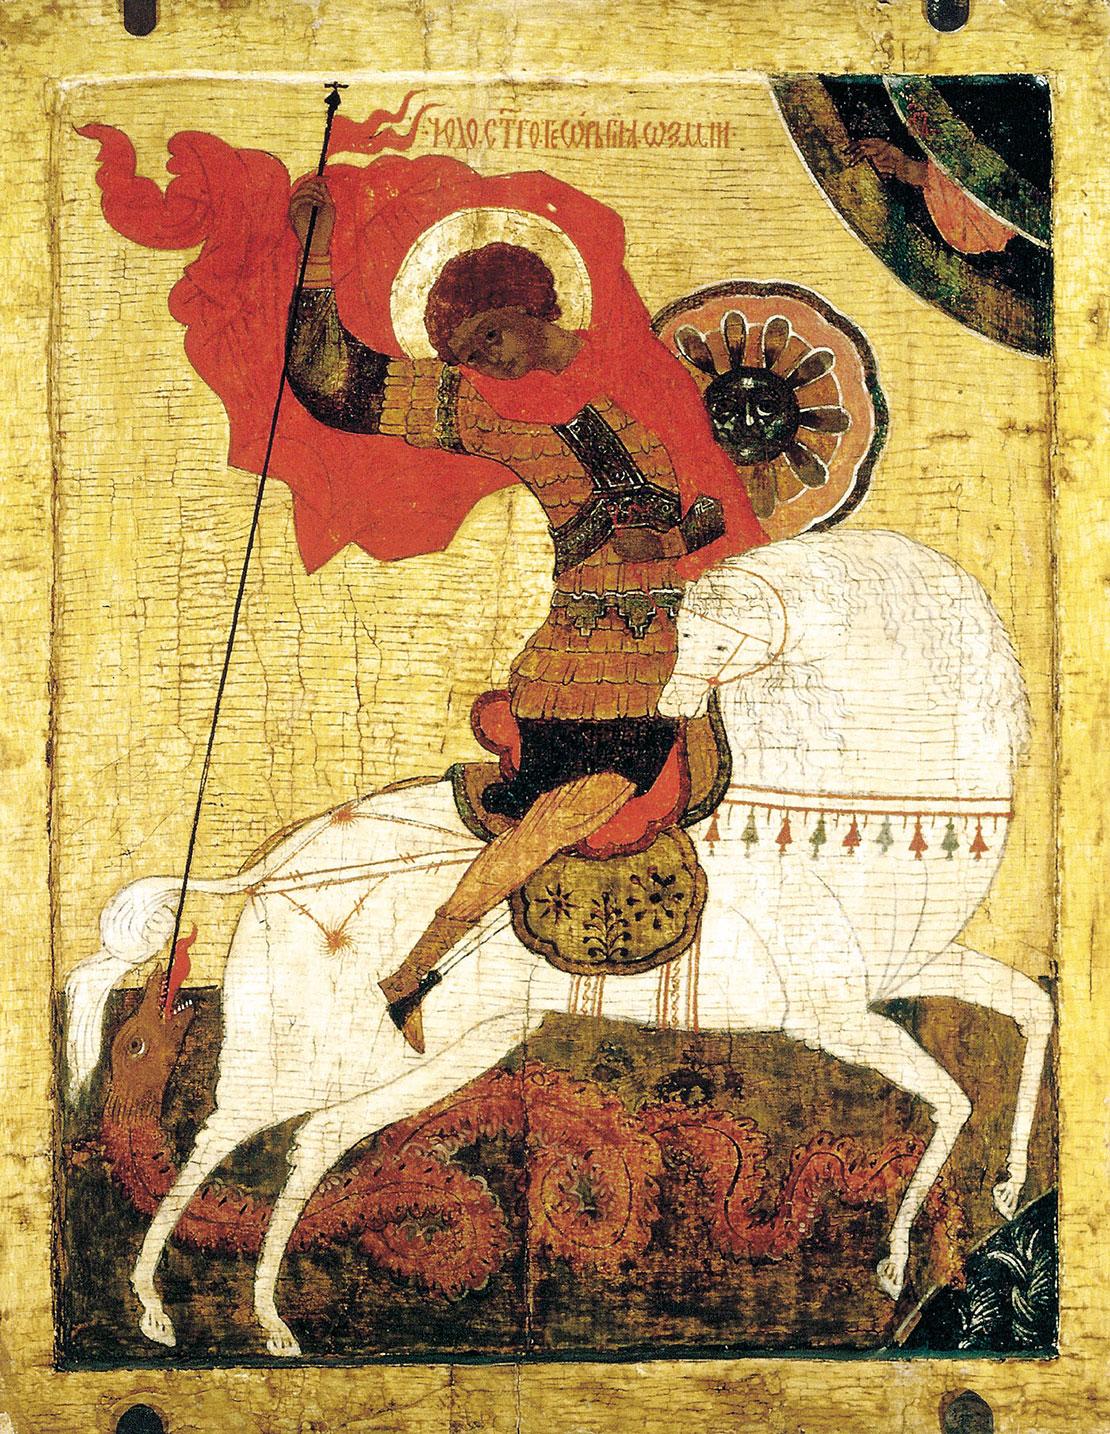 Св. Георгий на коне. Великий Новгород, XV век